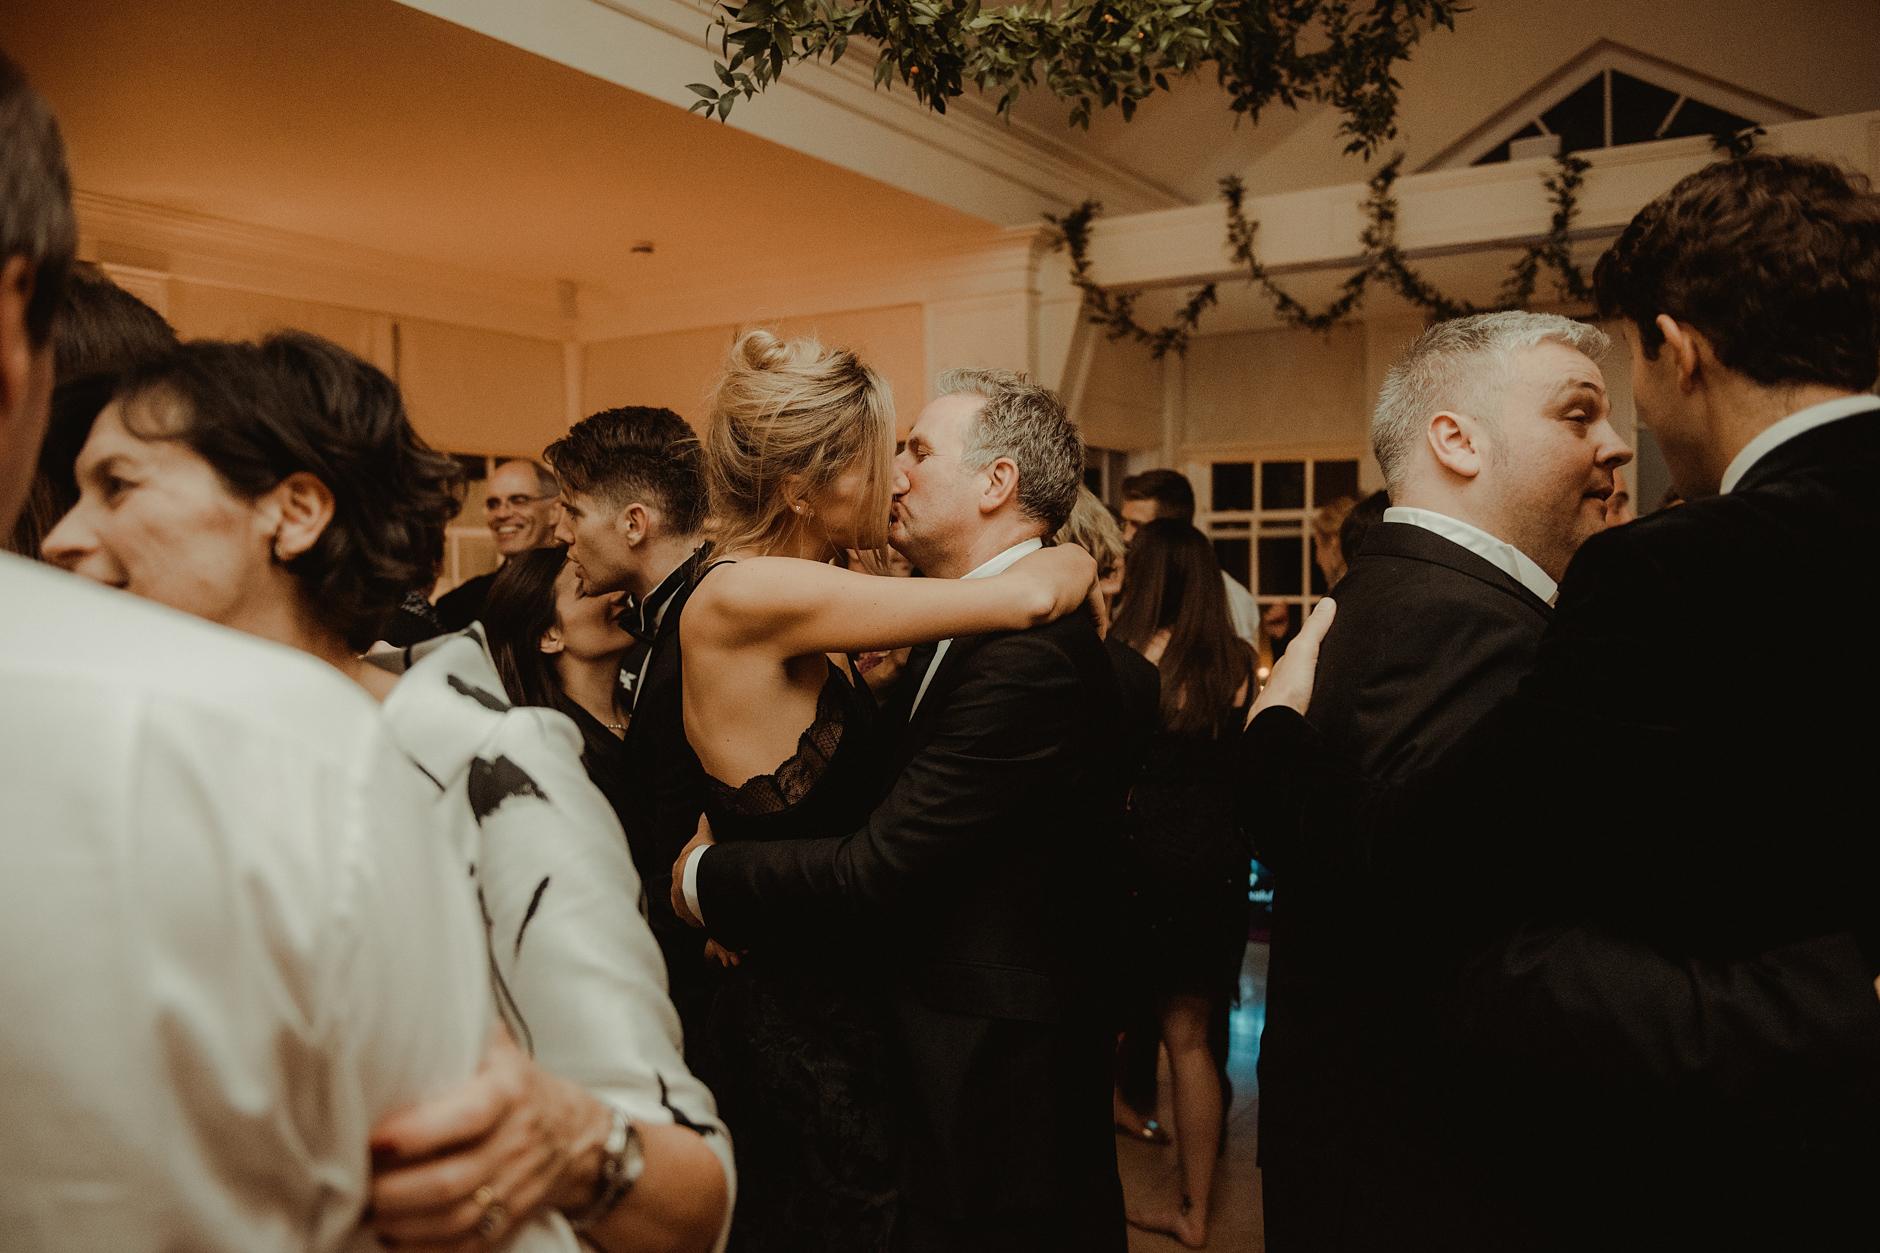 Glentruim-Wedding-Nikki-Leadbetter-Photography-359.jpg